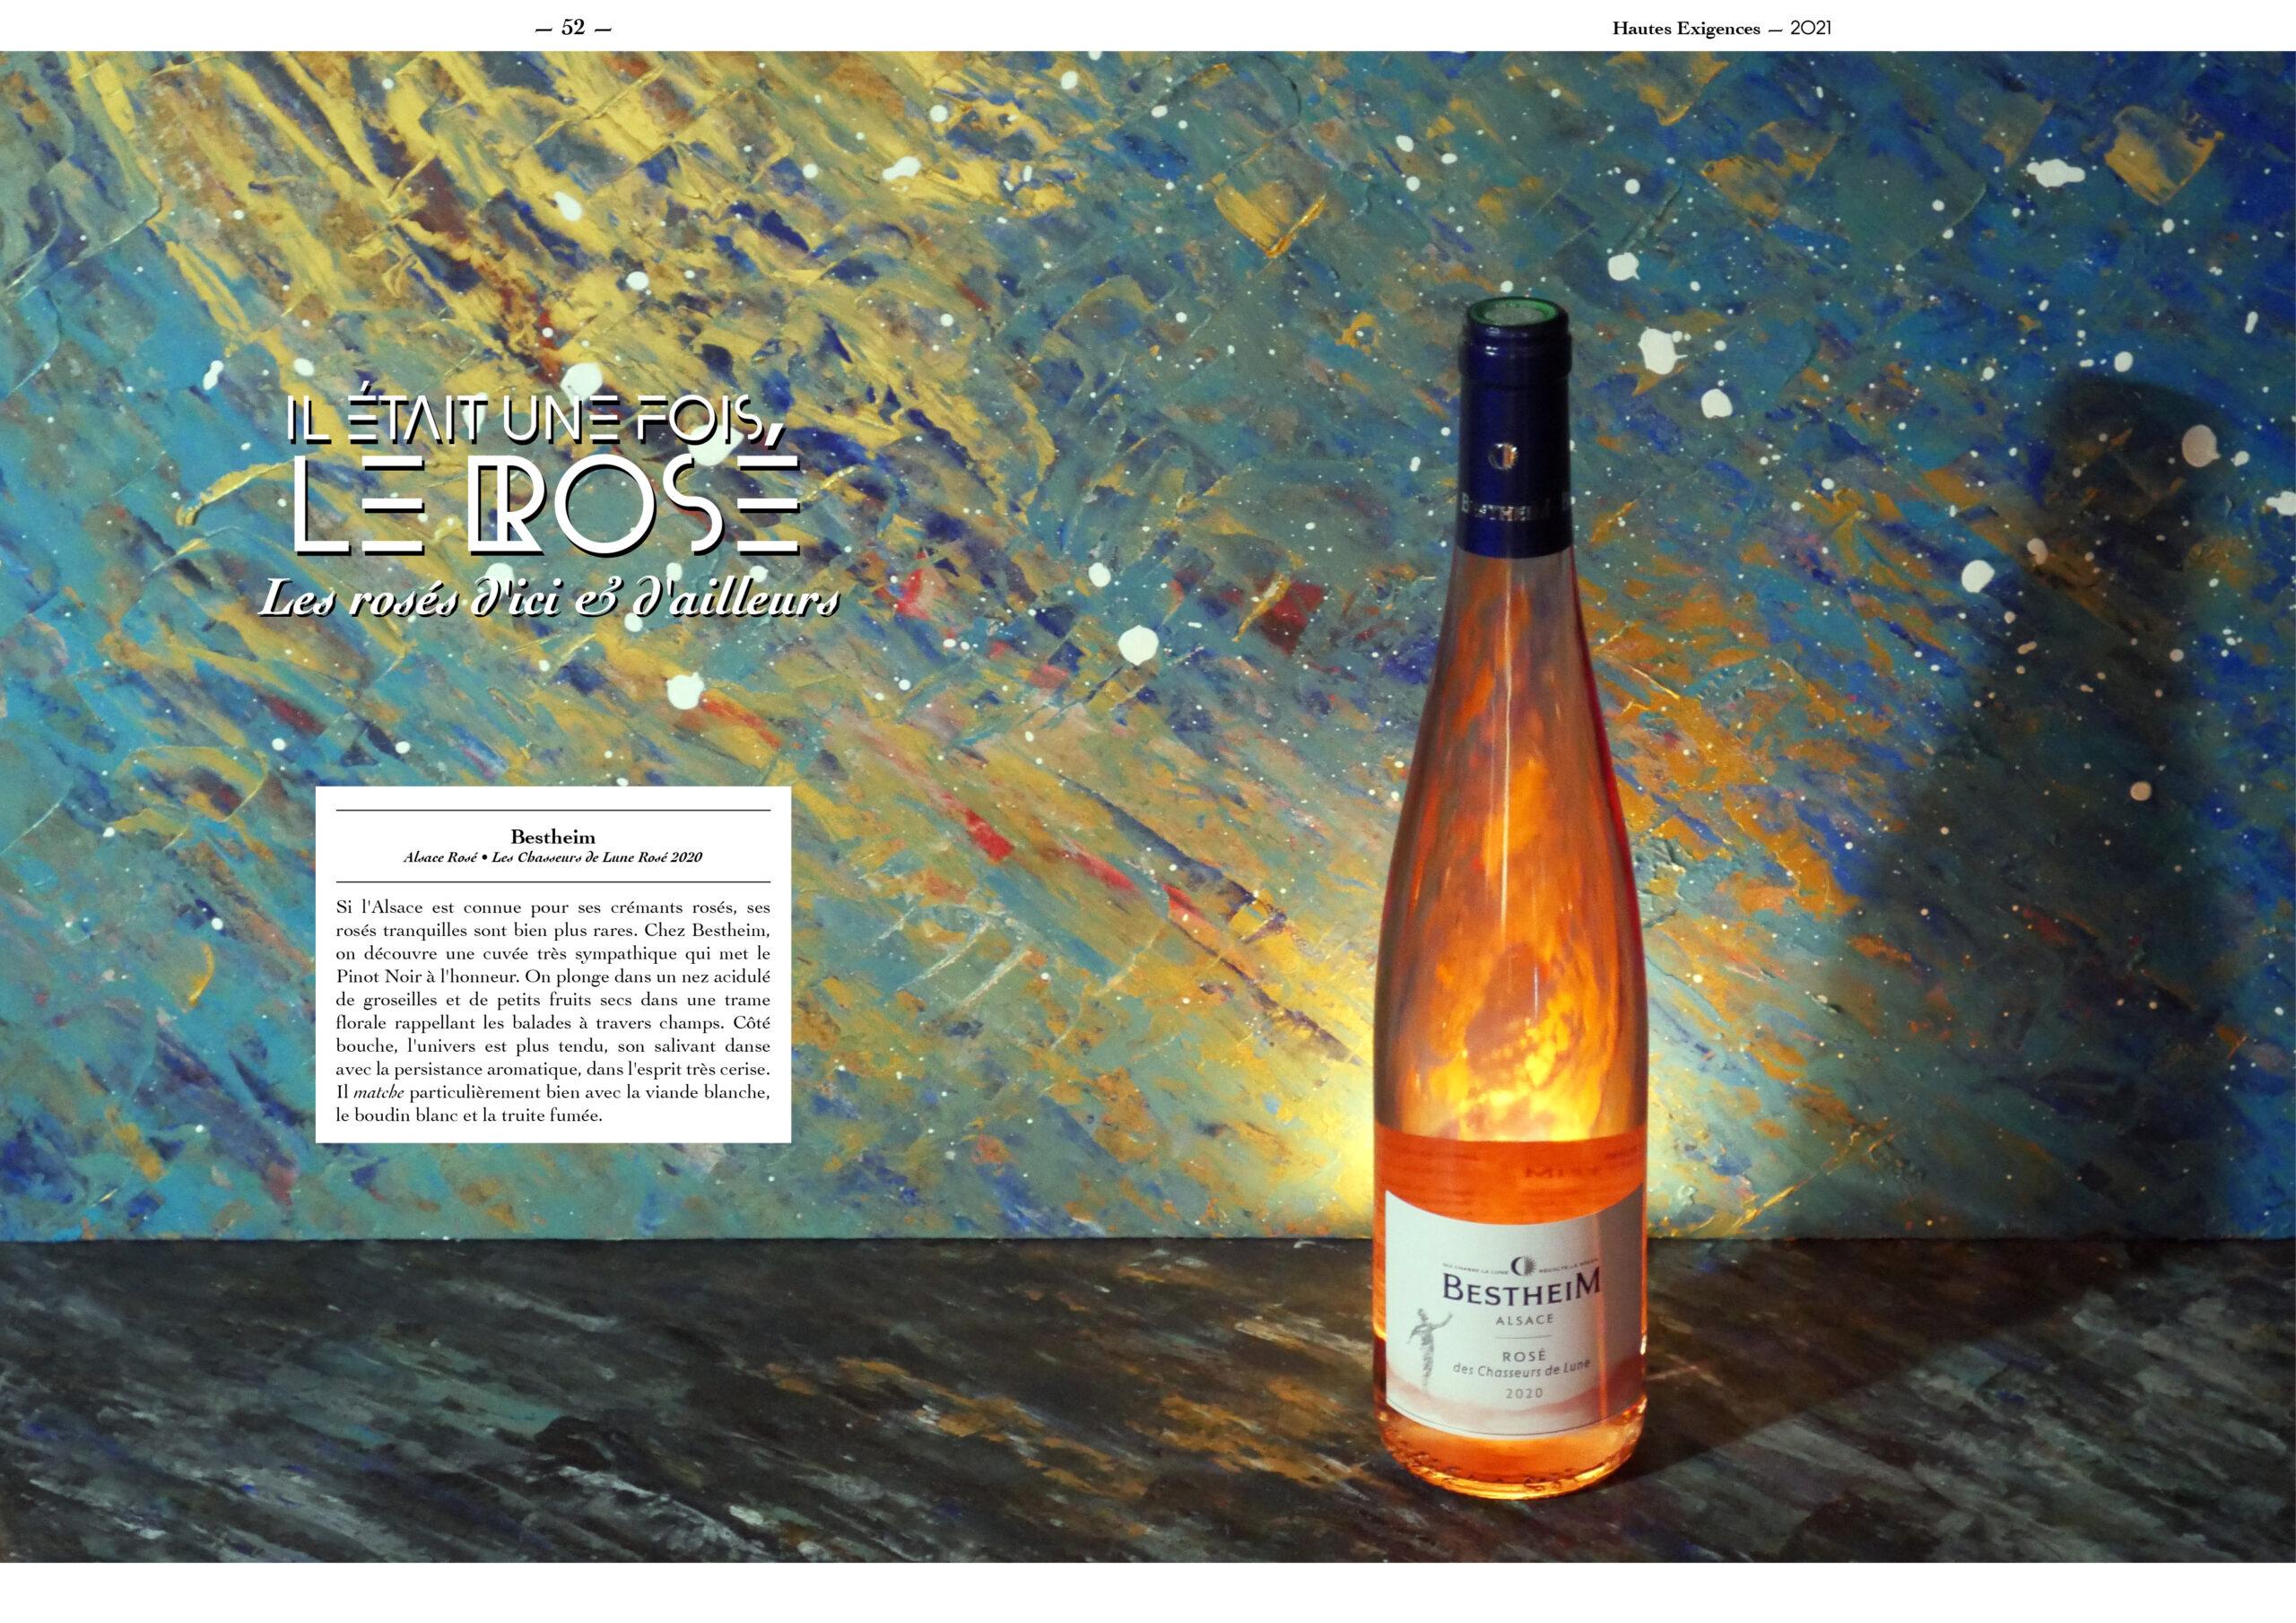 Hautes Exigences Magazine Hors Serie 2021 page 52-53